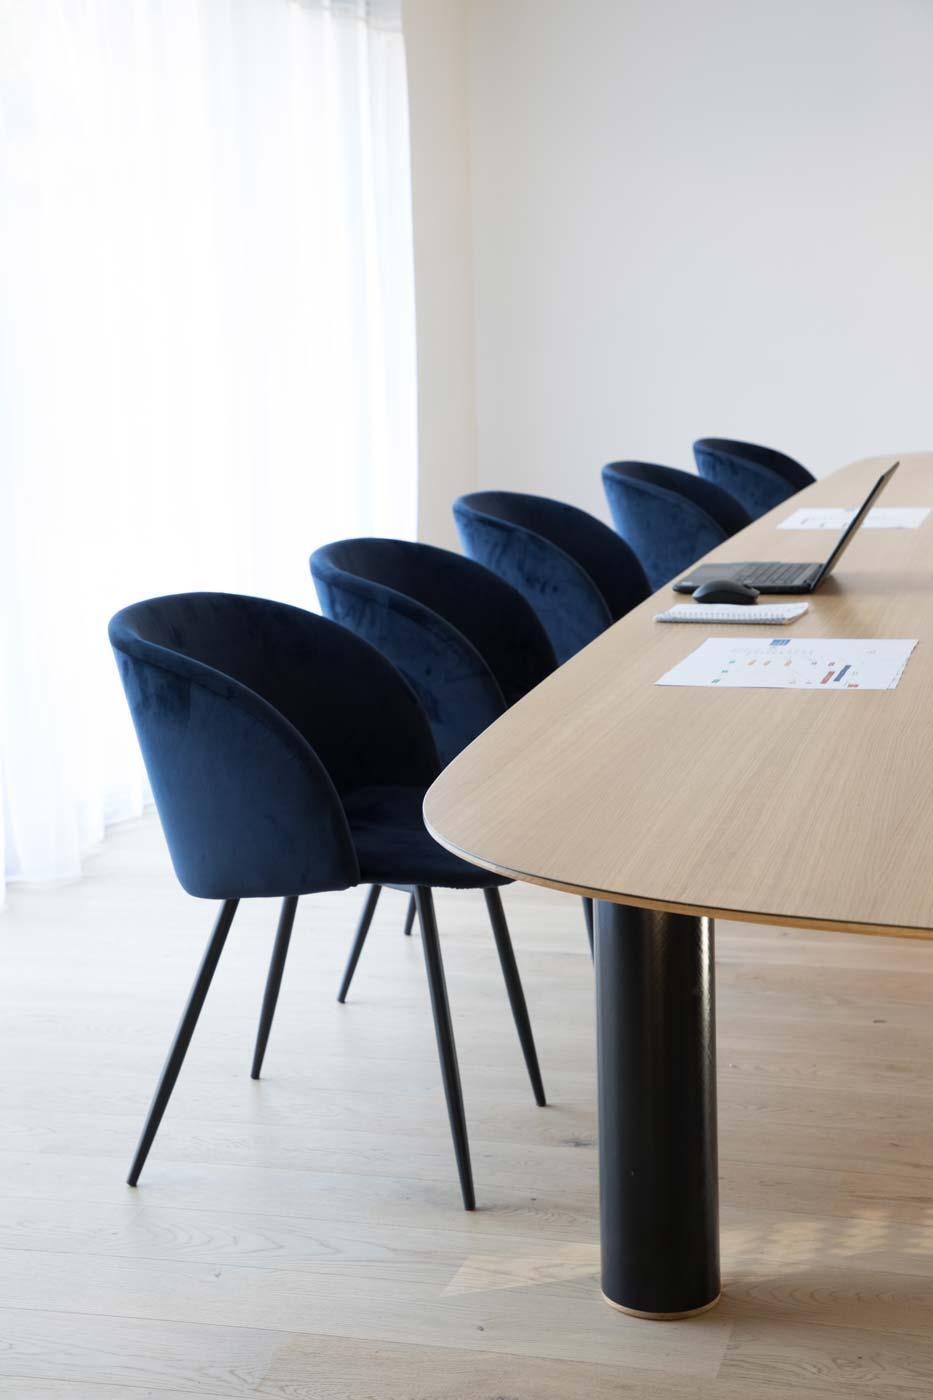 Pilotis Bassin meeting table